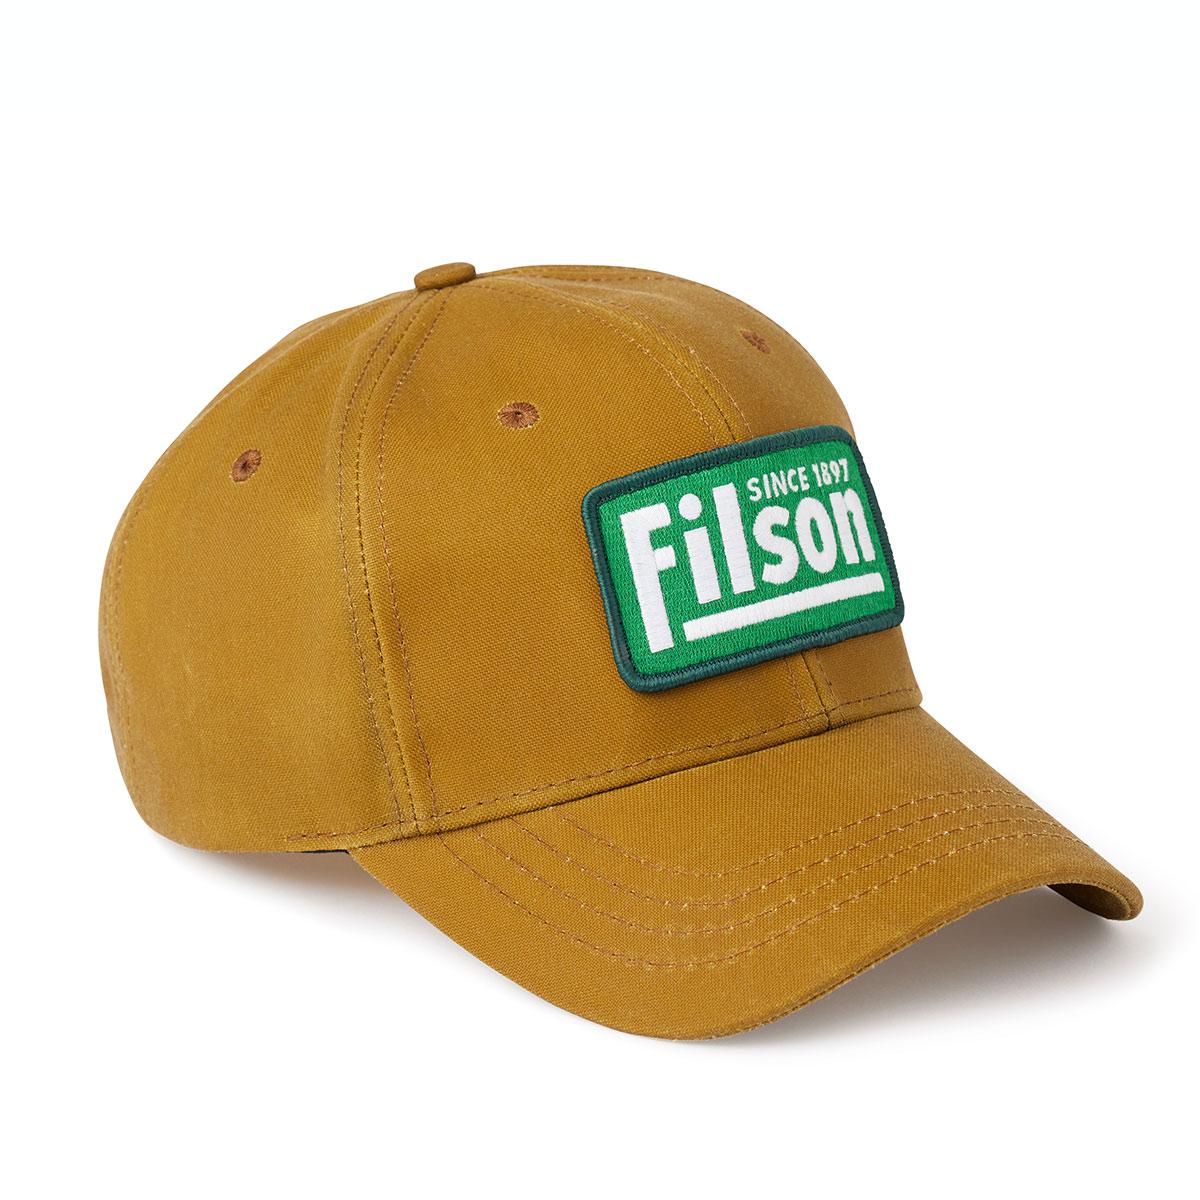 Filson Oil Tin Logger Cap 20180529-Tan